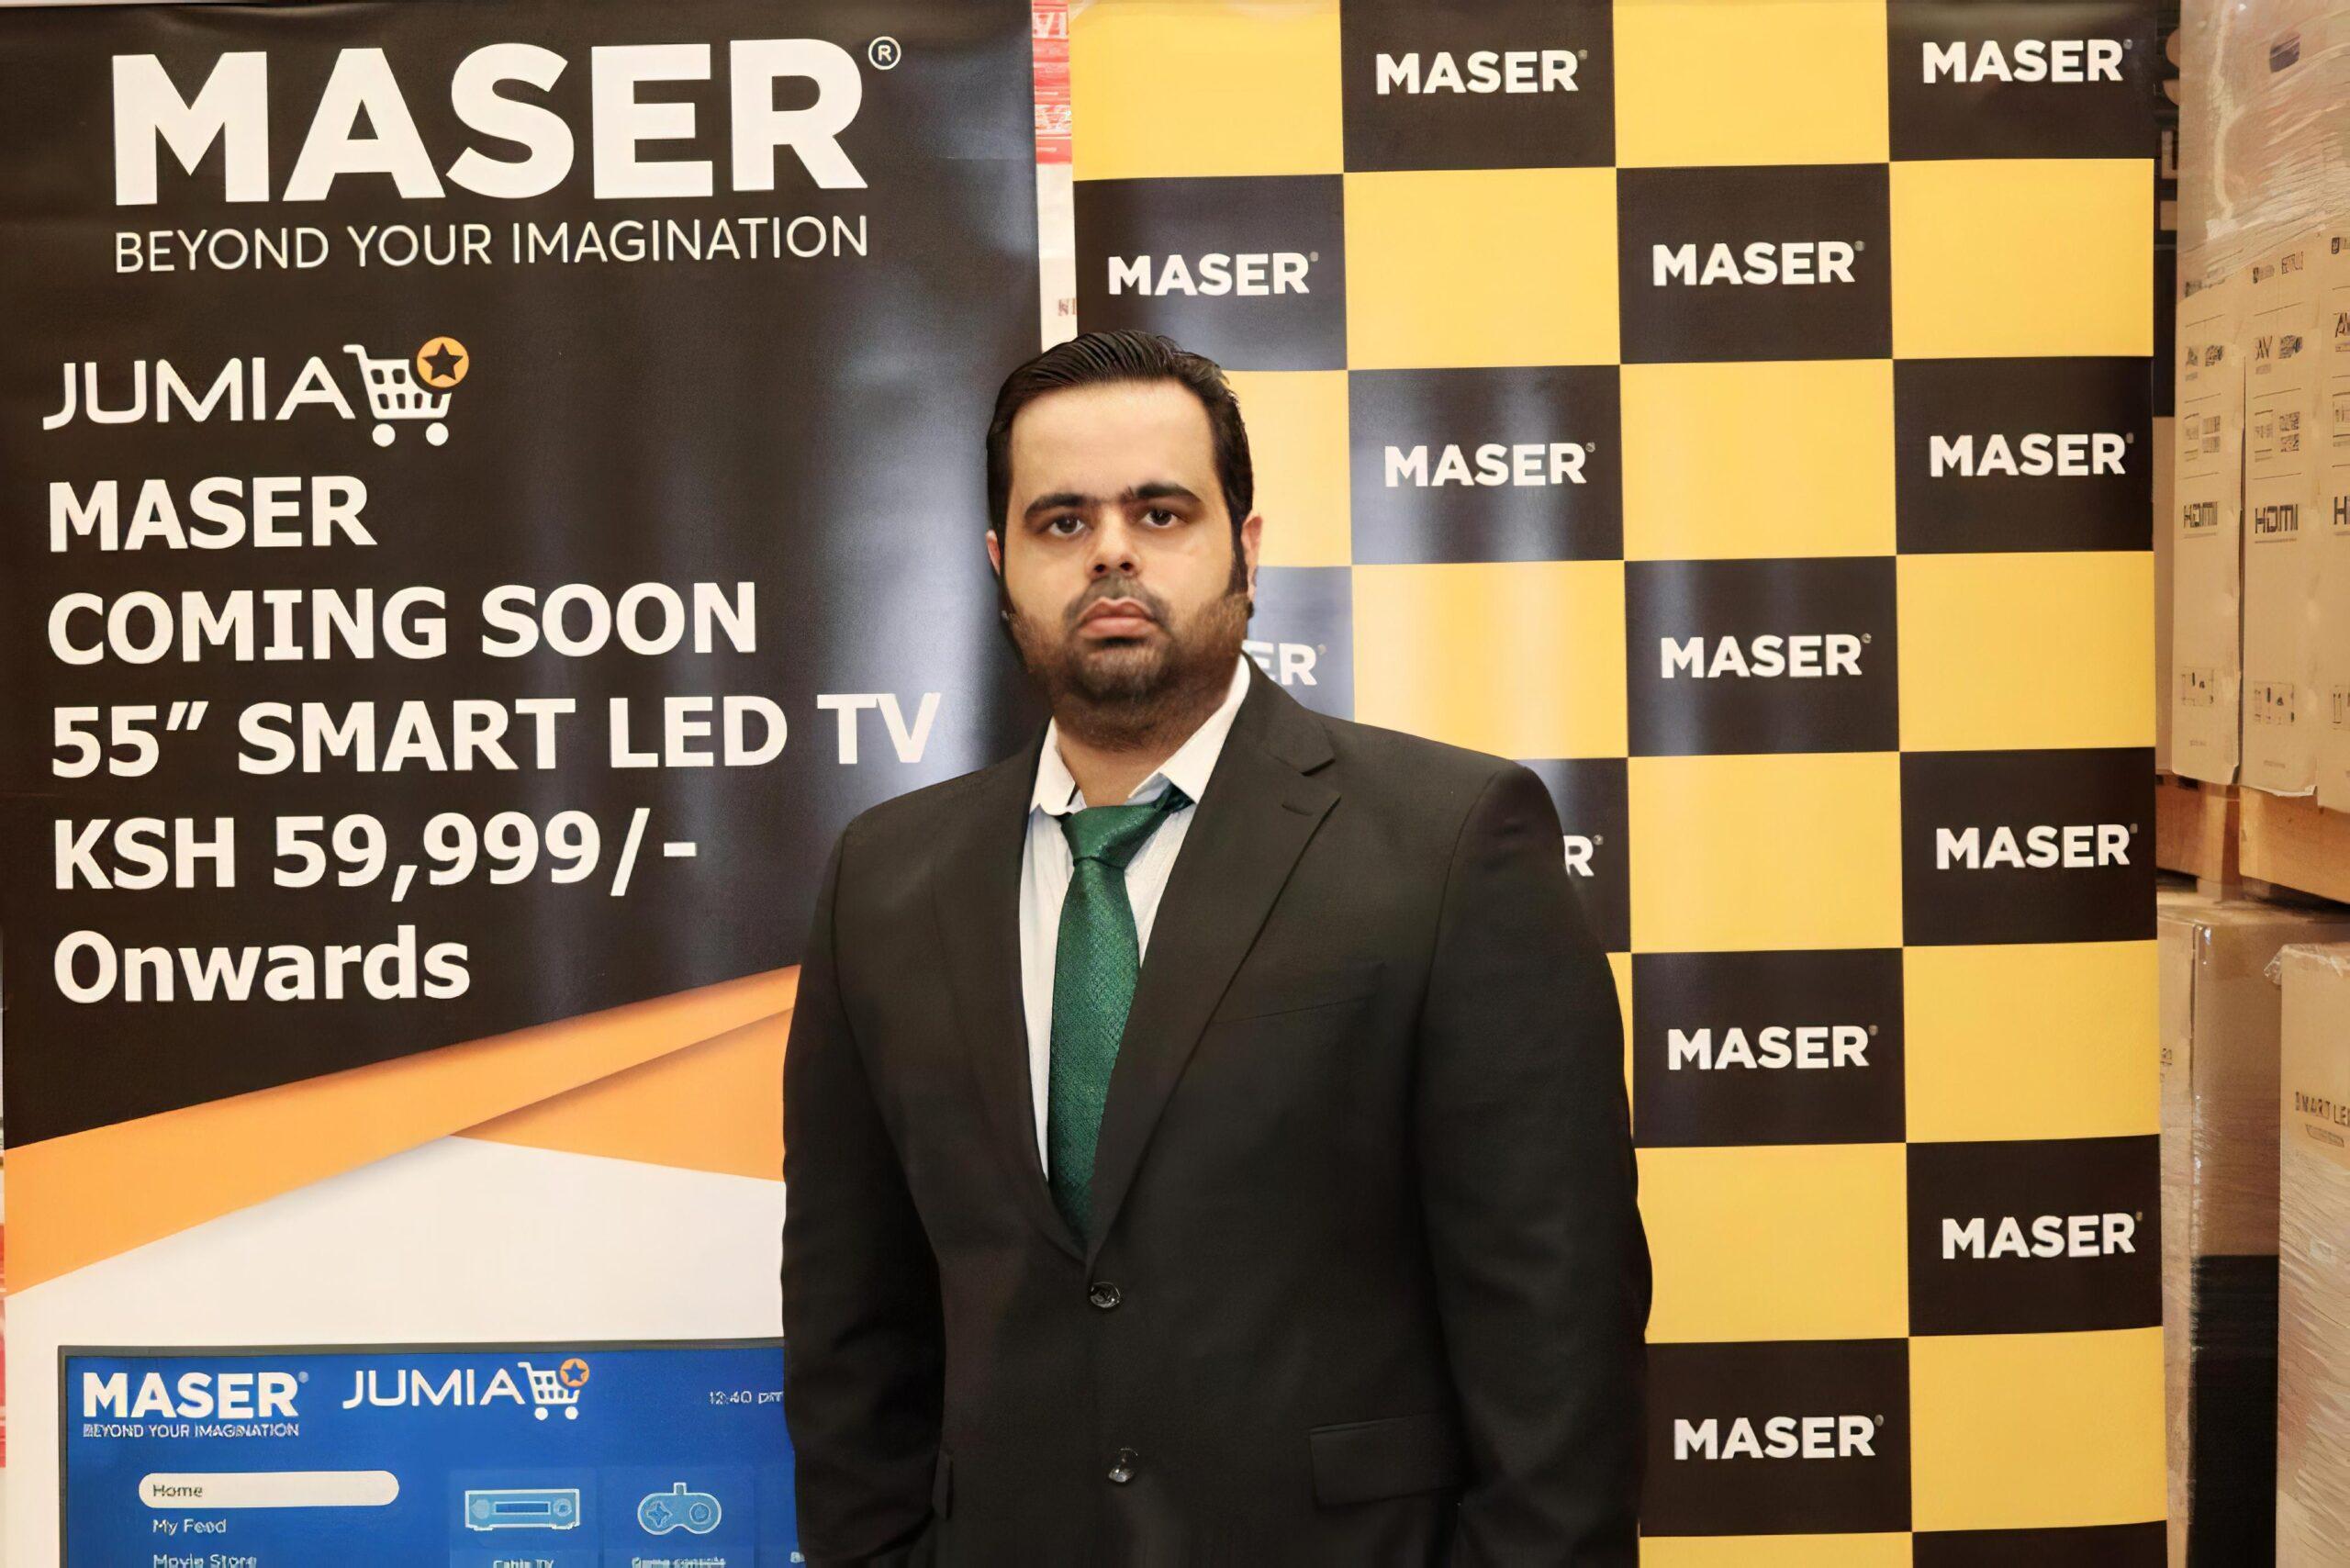 Prateek Suri, founder and CEO of UAE-based TV and electronics brand Maser